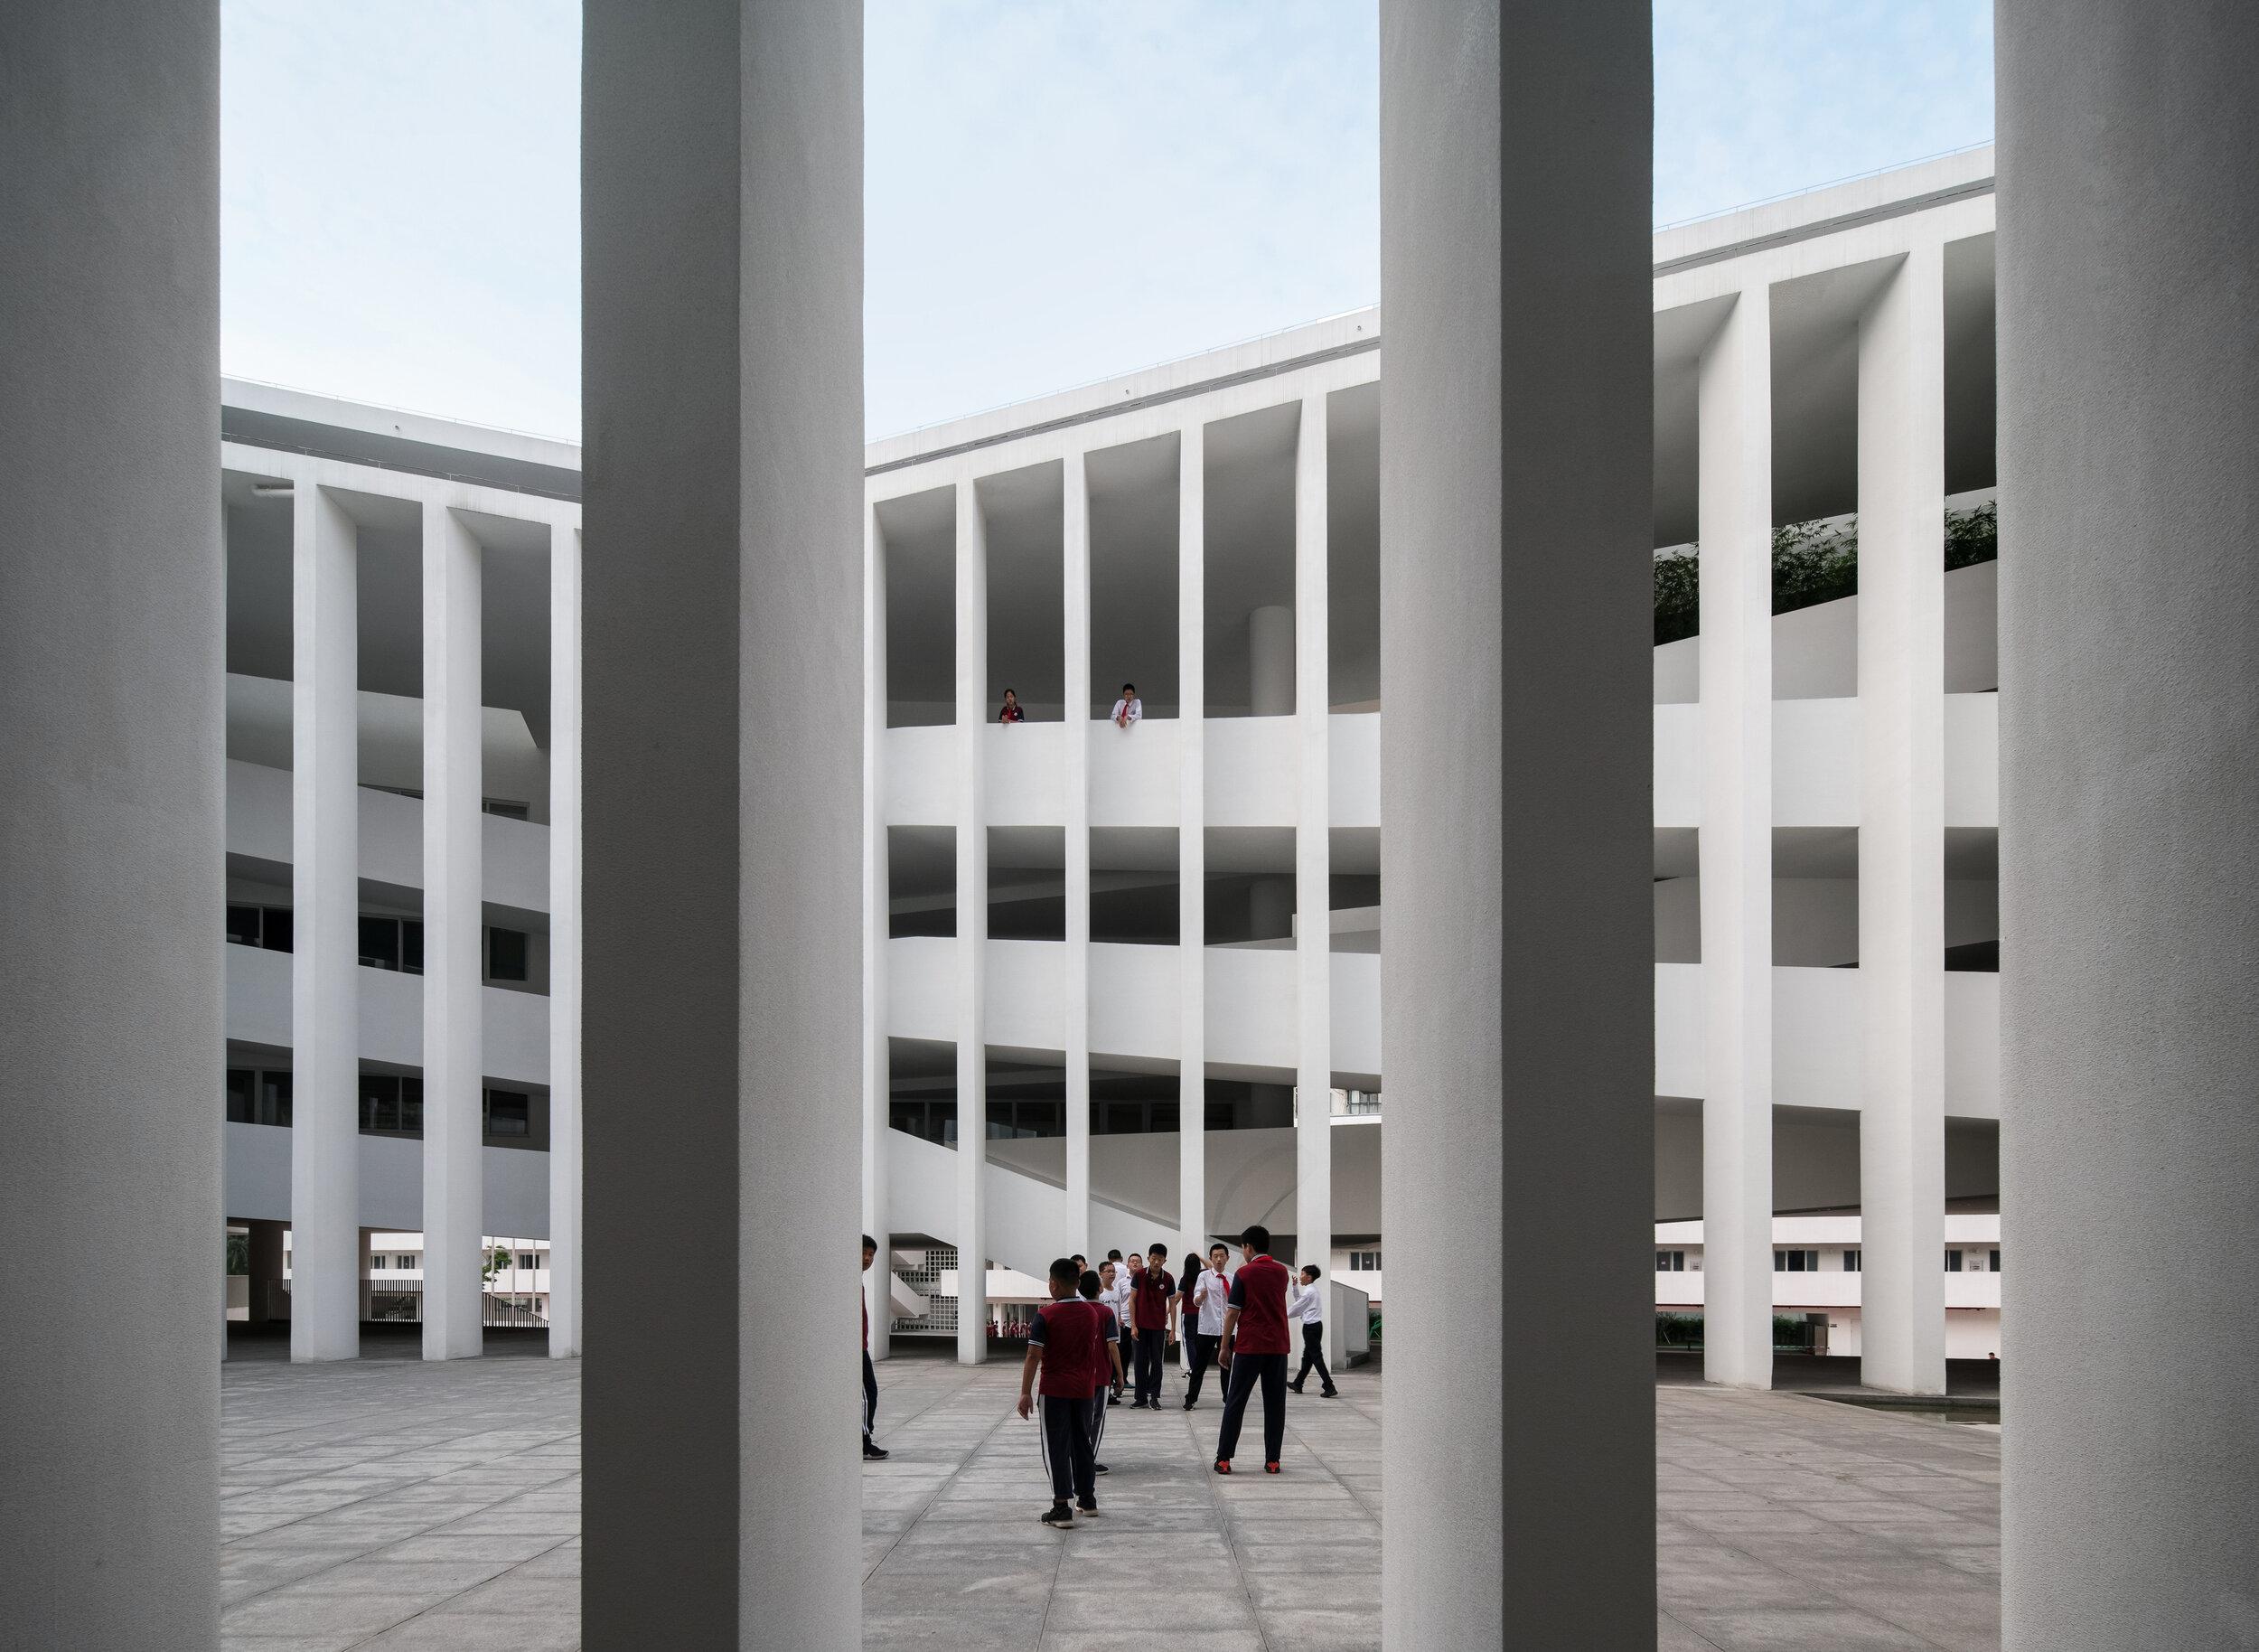 23 柱廊及漫游空間 ?是然建筑攝影 Colonnade and wandering space ?Schran Images.jpg